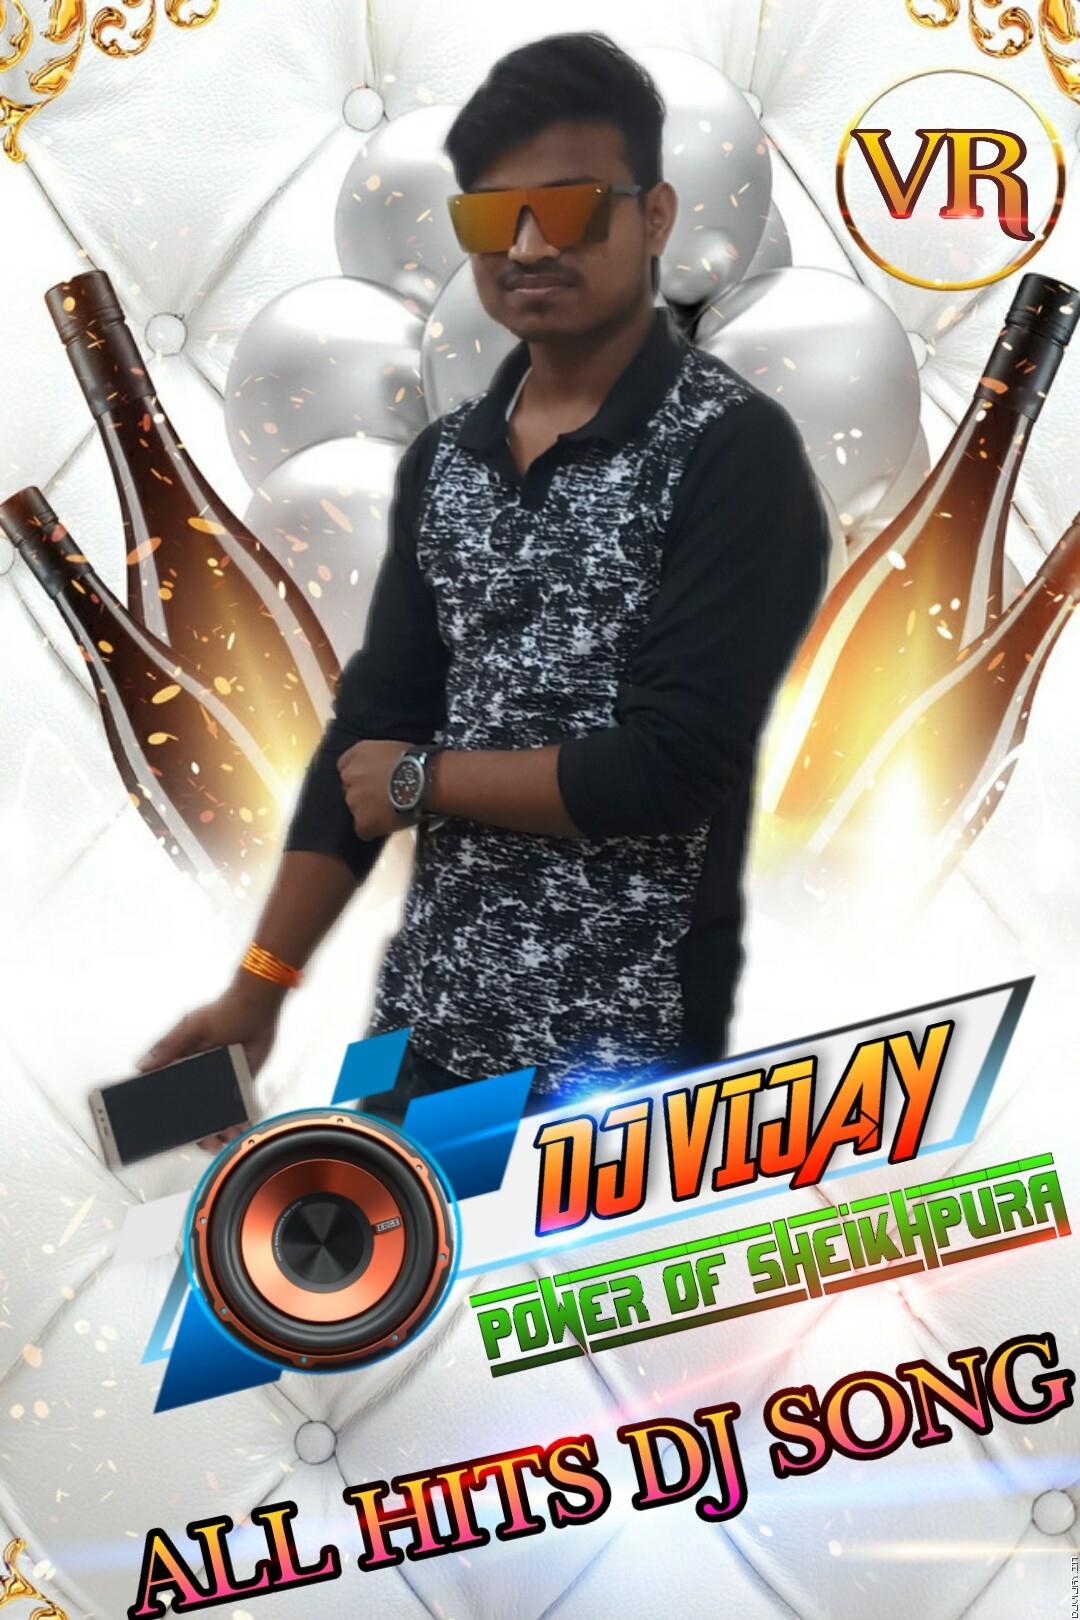 Mann_Leke_Aaya_Mata_Rani_Ke_Bhawan--Dandiya_Jhumar_Mix_By_Dj_vijay.mp3